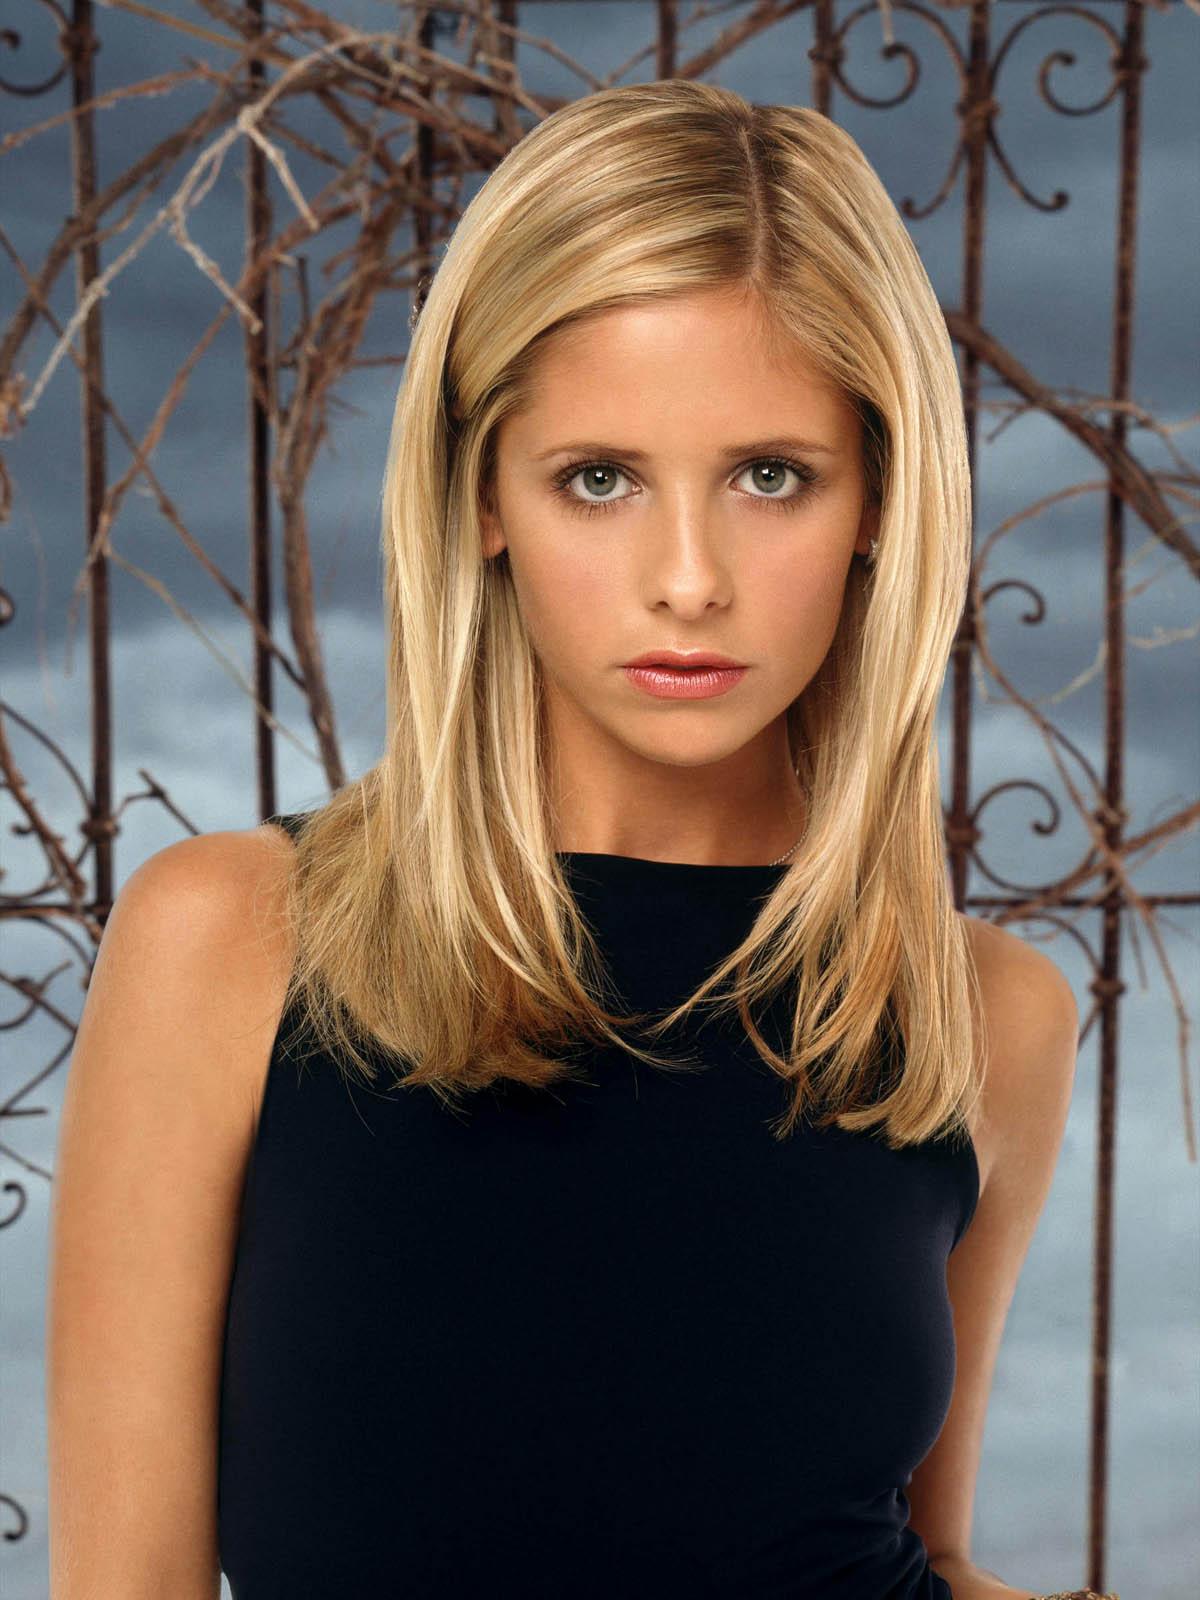 Image - Buffy-sarah michelle gellar jpg | Buffyverse Wiki | Fandom